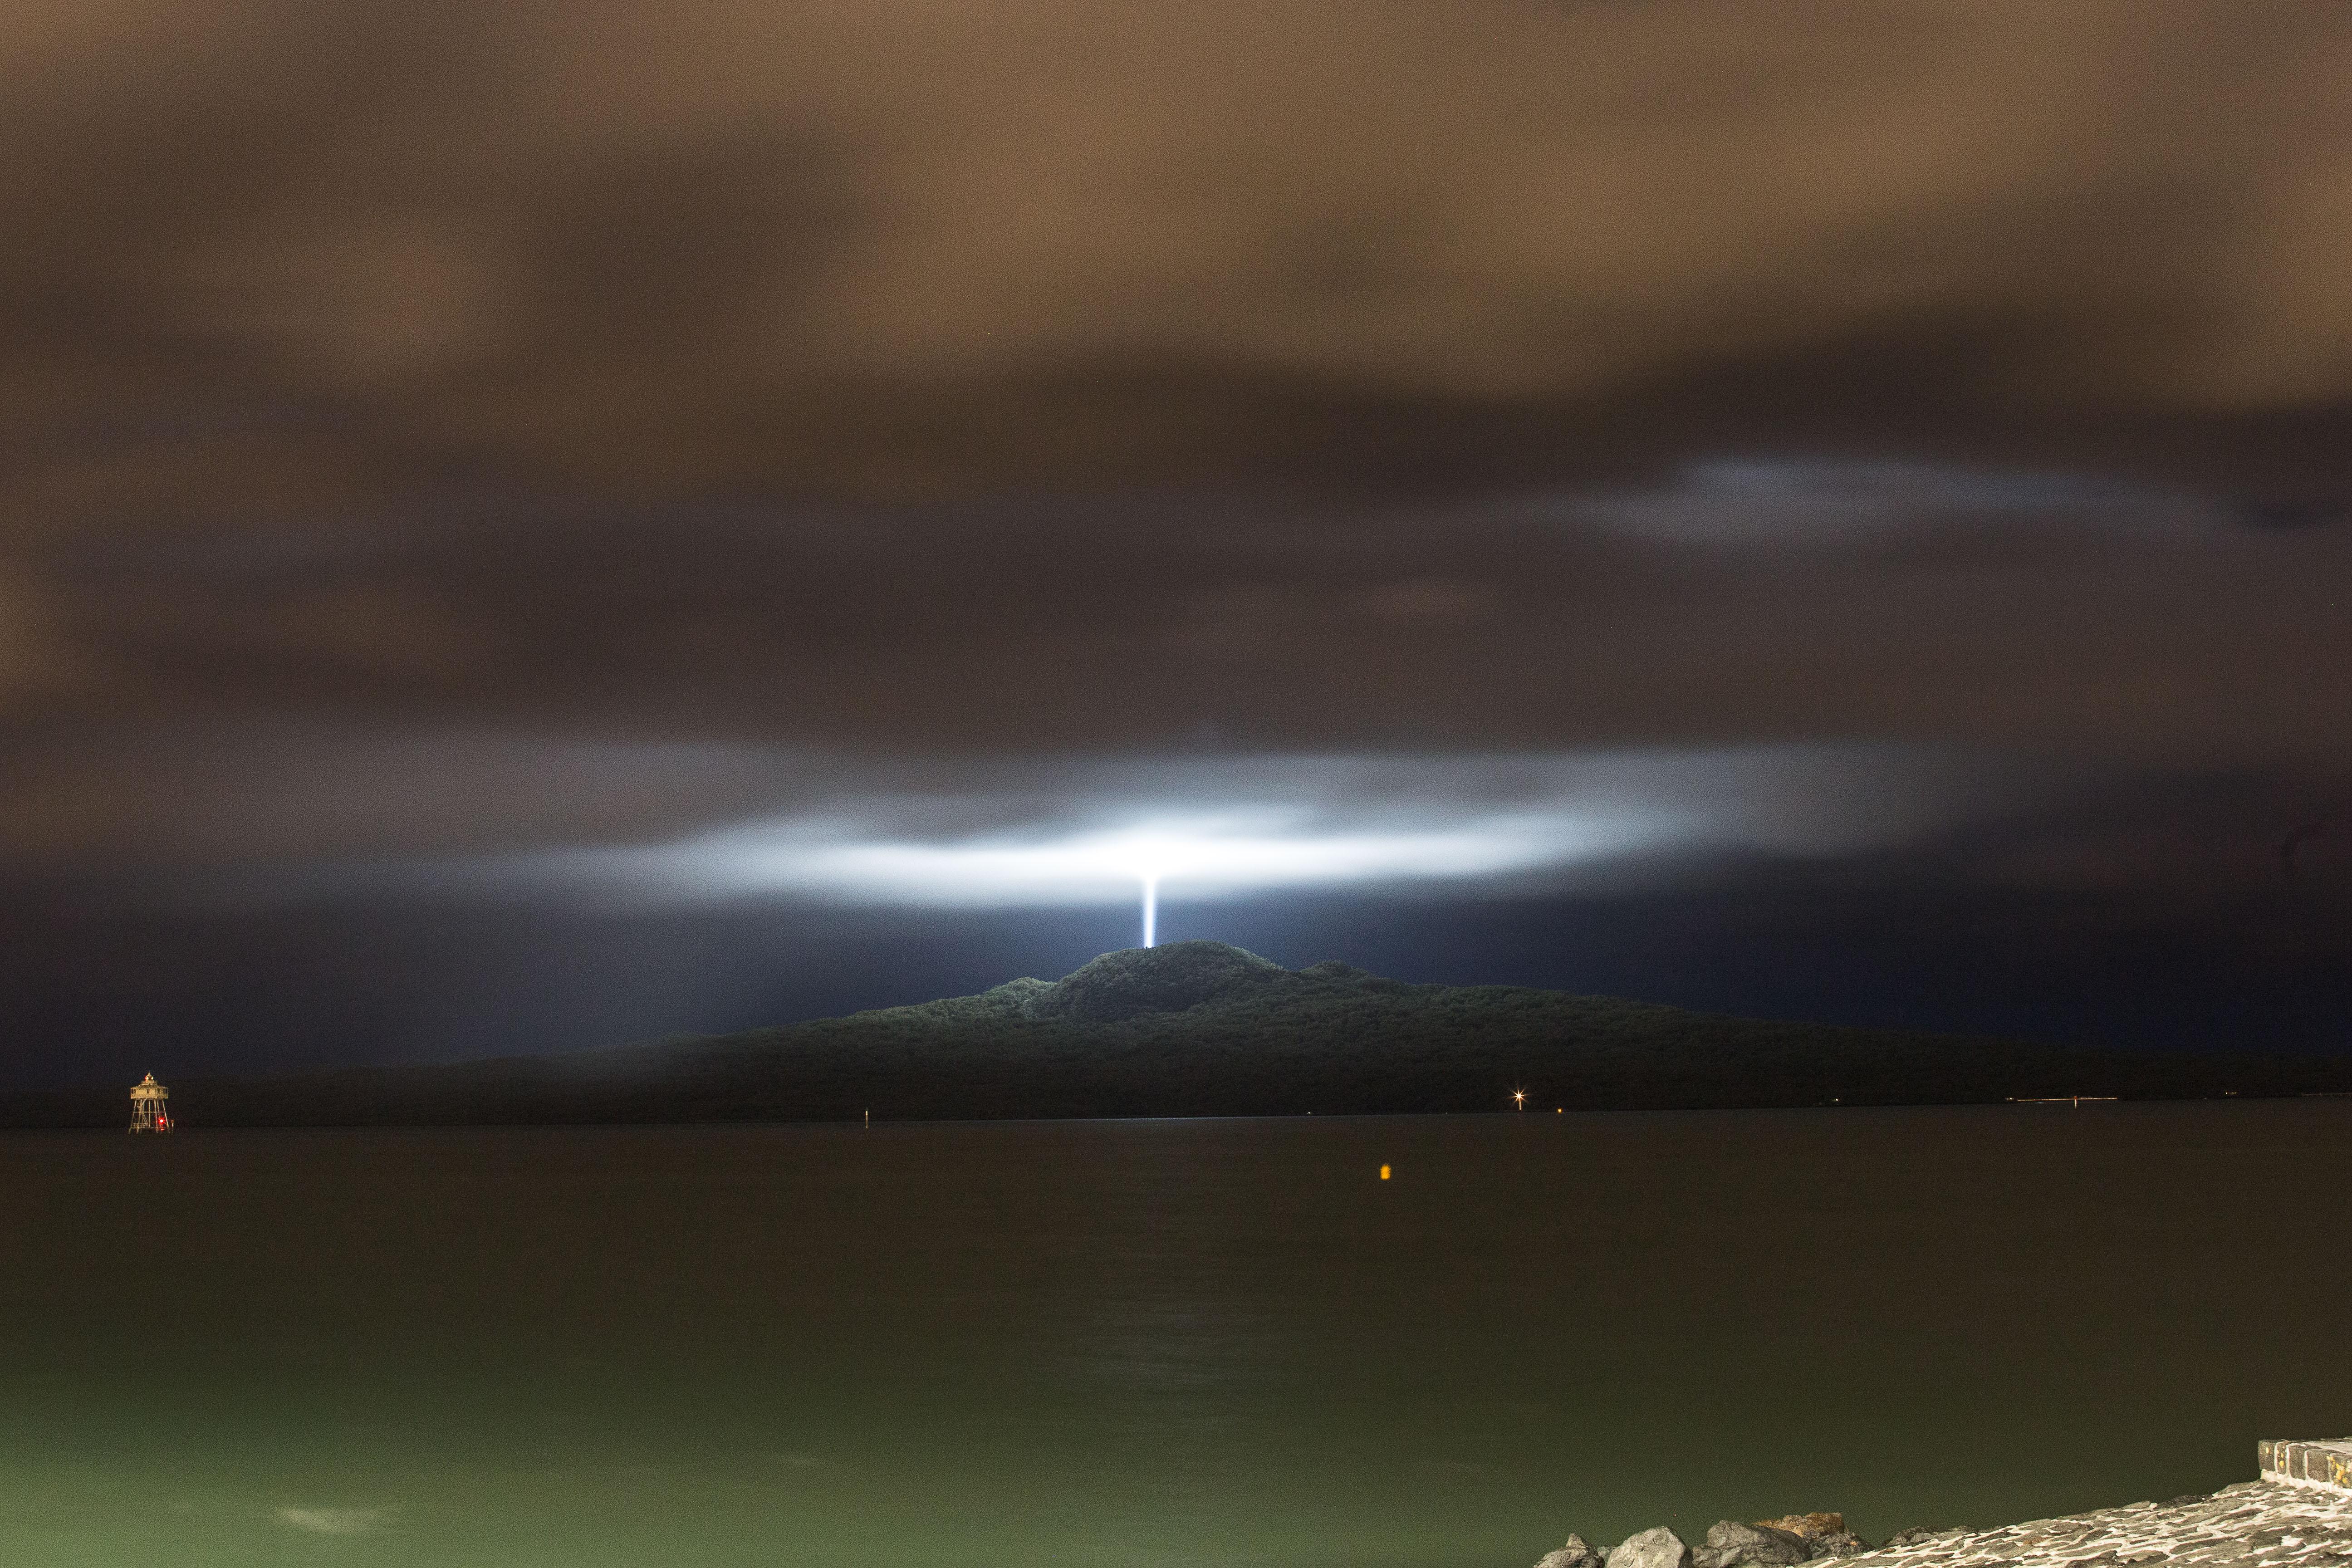 No aliens here: Rangitoto light show celebrates city's Maori heritage